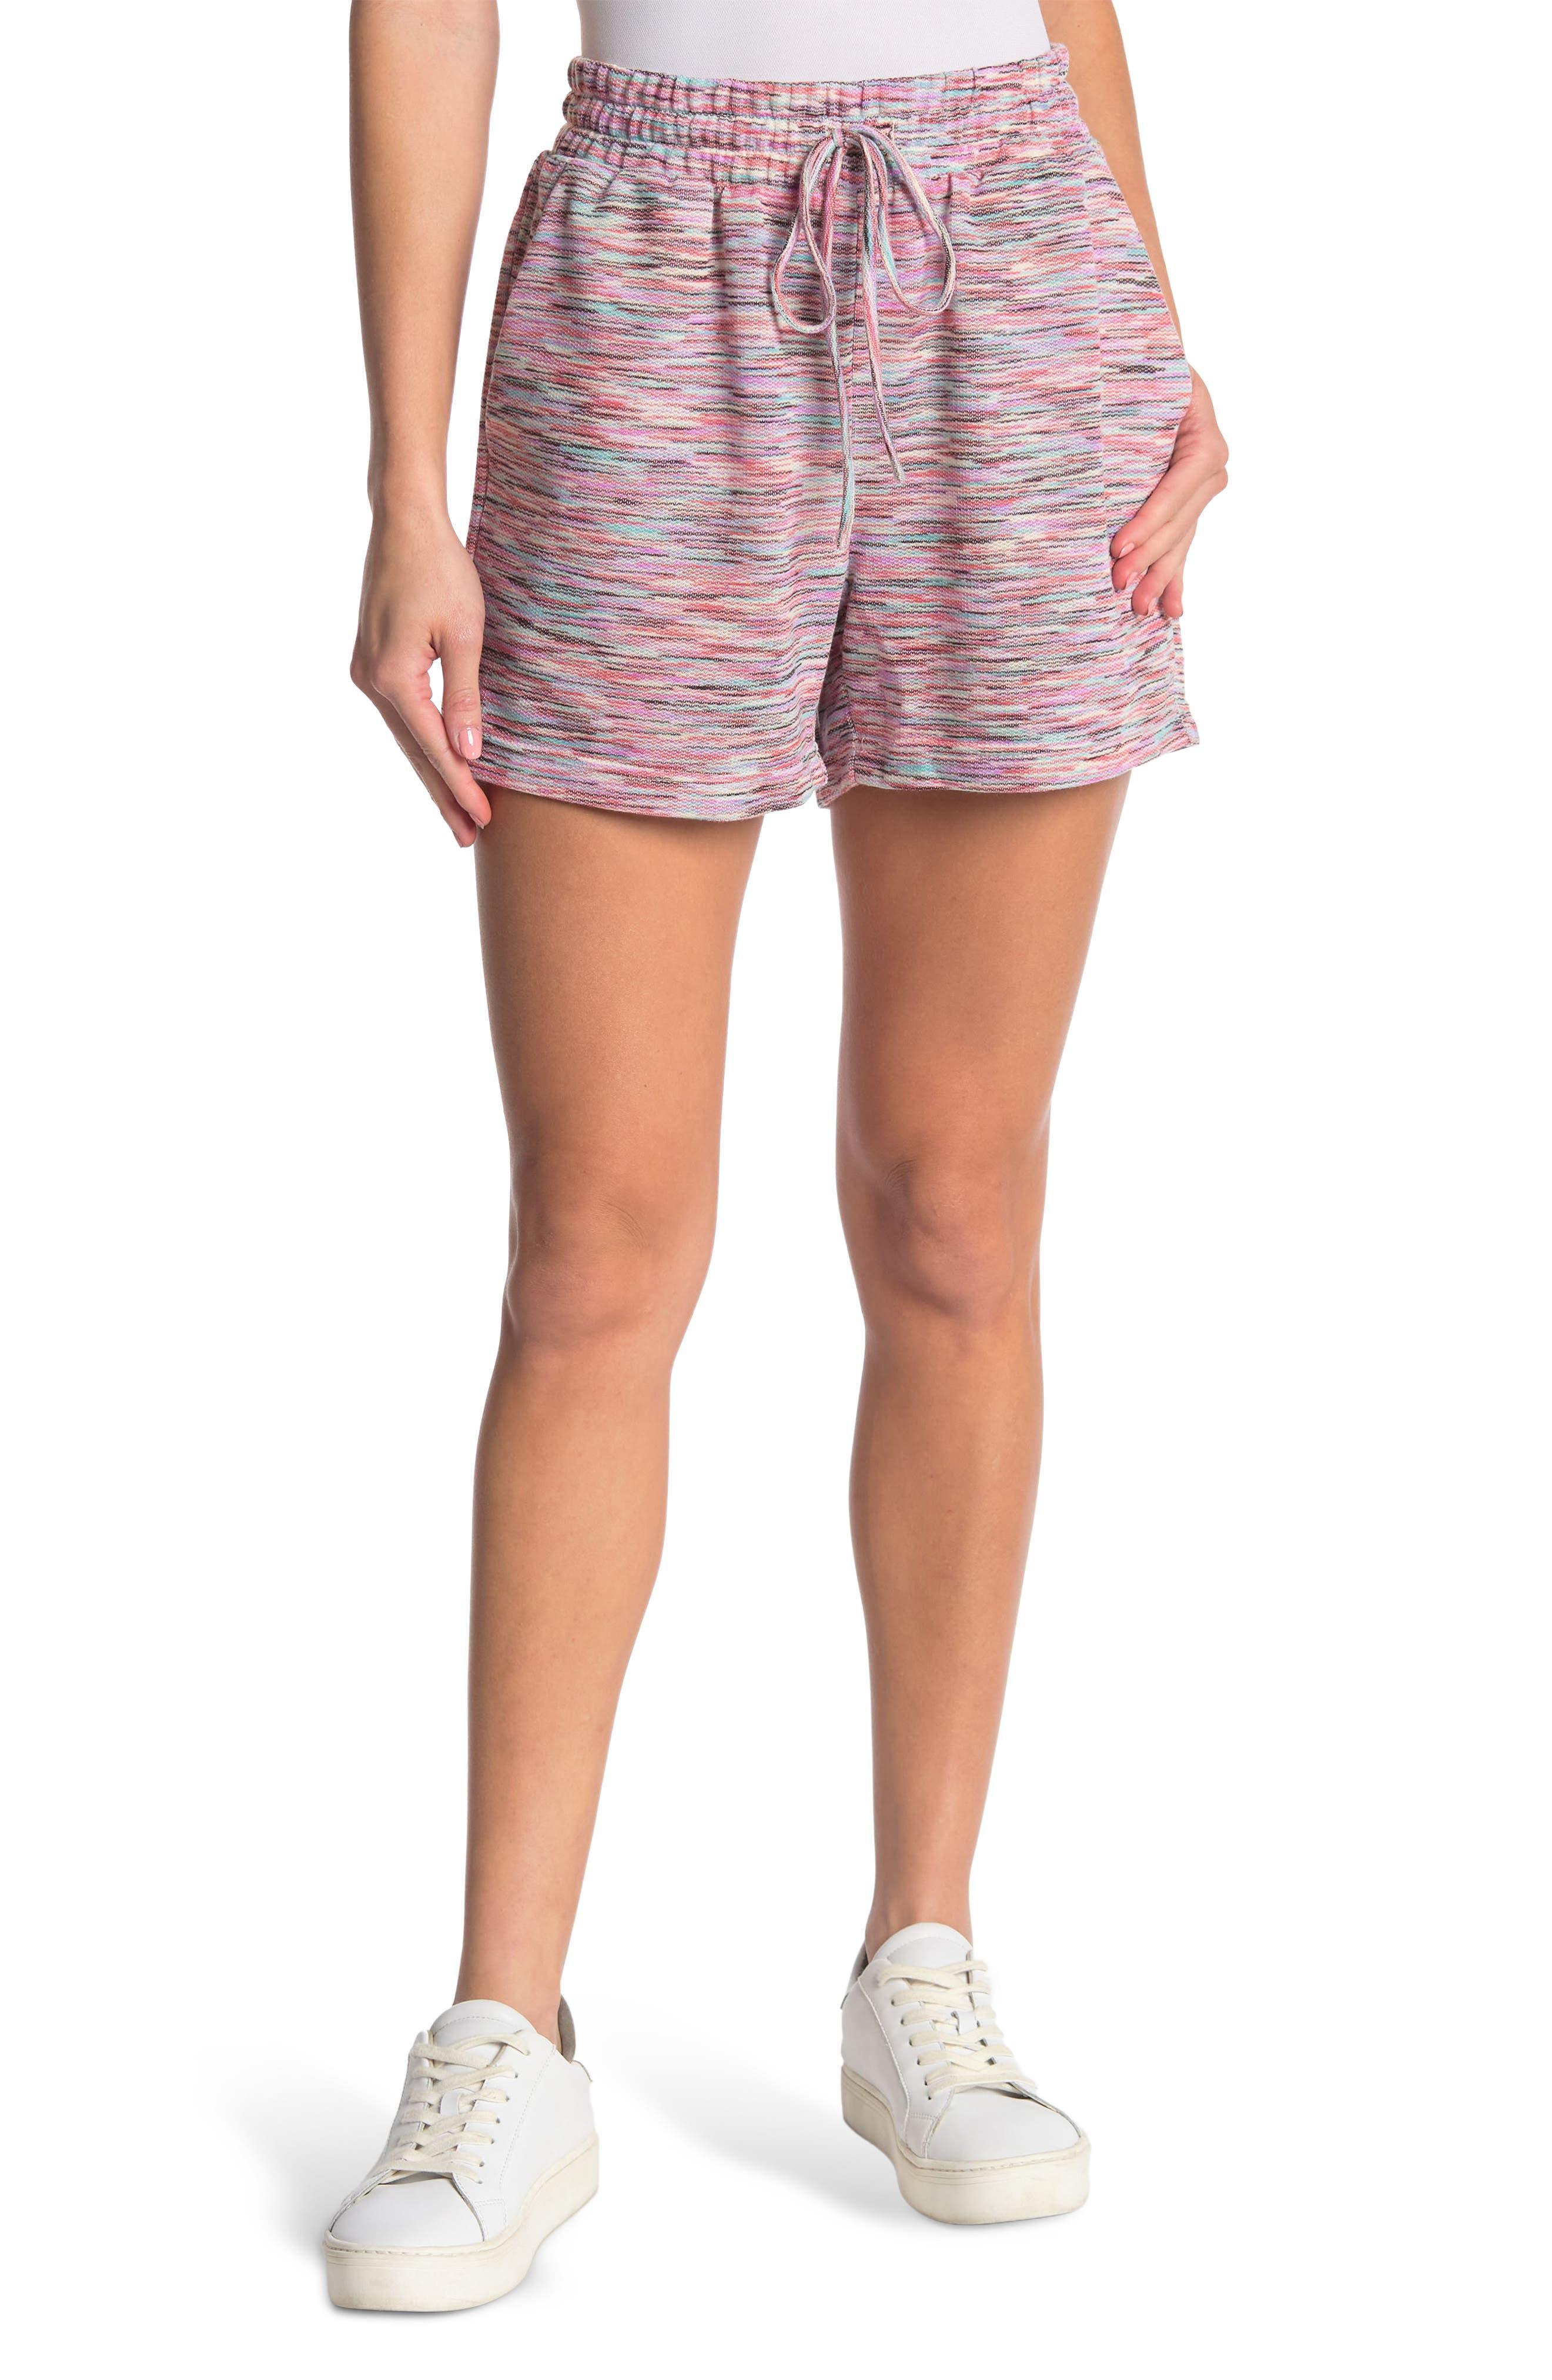 Melloday Drawstring Knit Shorts In Medium Pink7